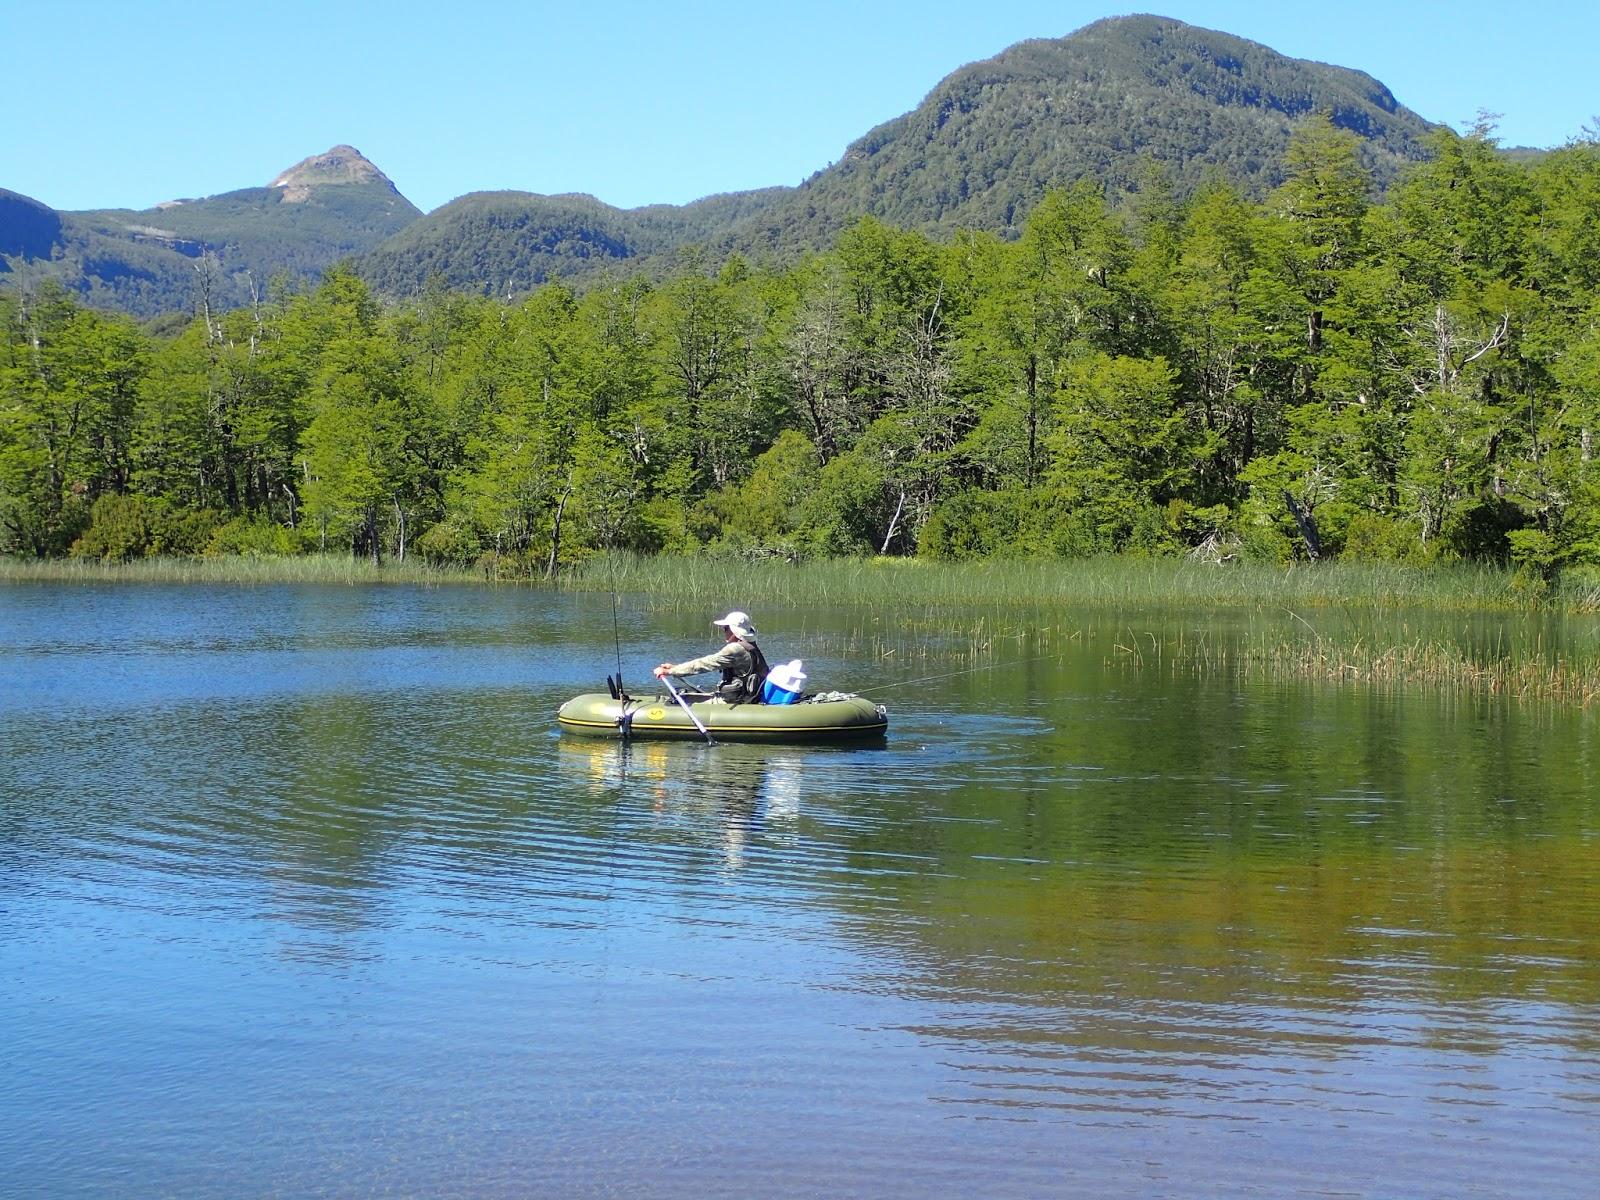 First cast fly fishing diy float patagonia kodiak water for Fly fishing patagonia